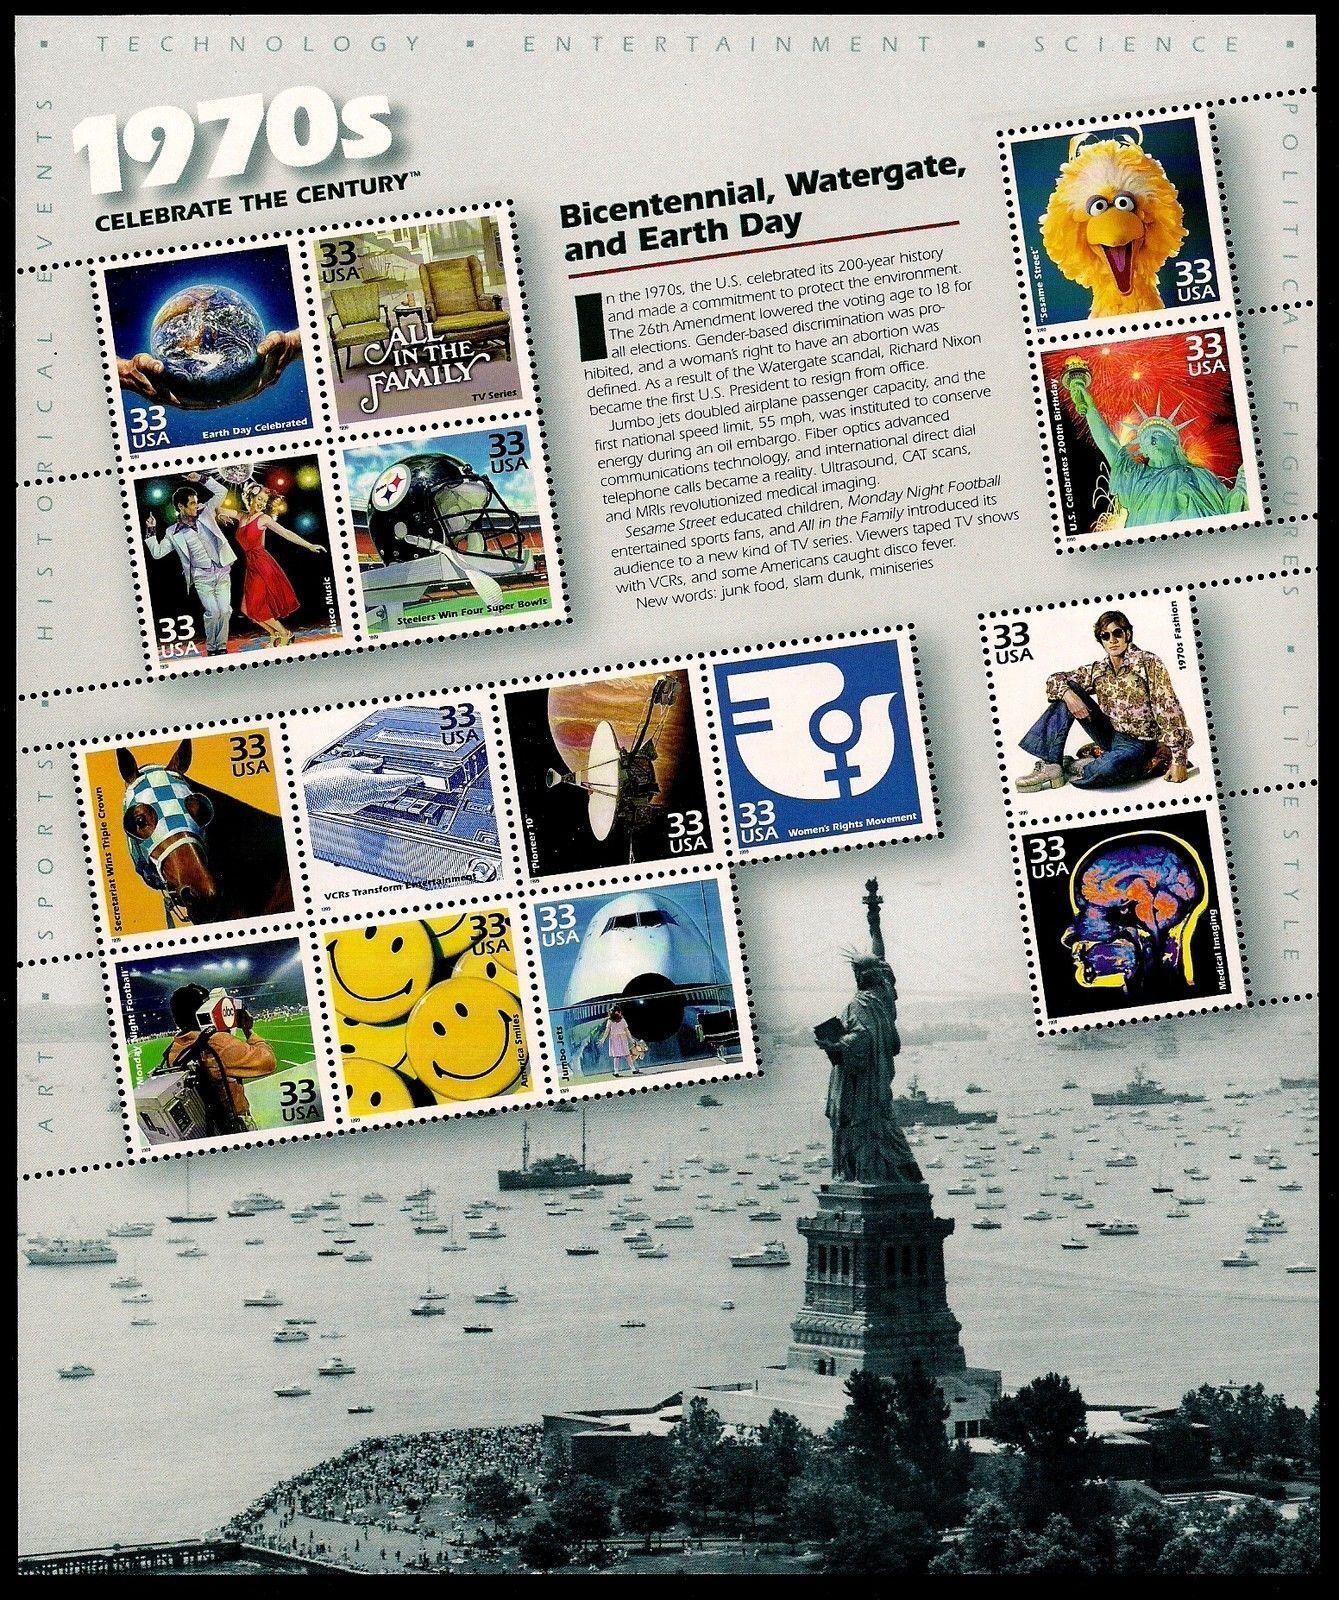 2000 33c 1970's Celebrate the Century, Sheet of 15 Scot